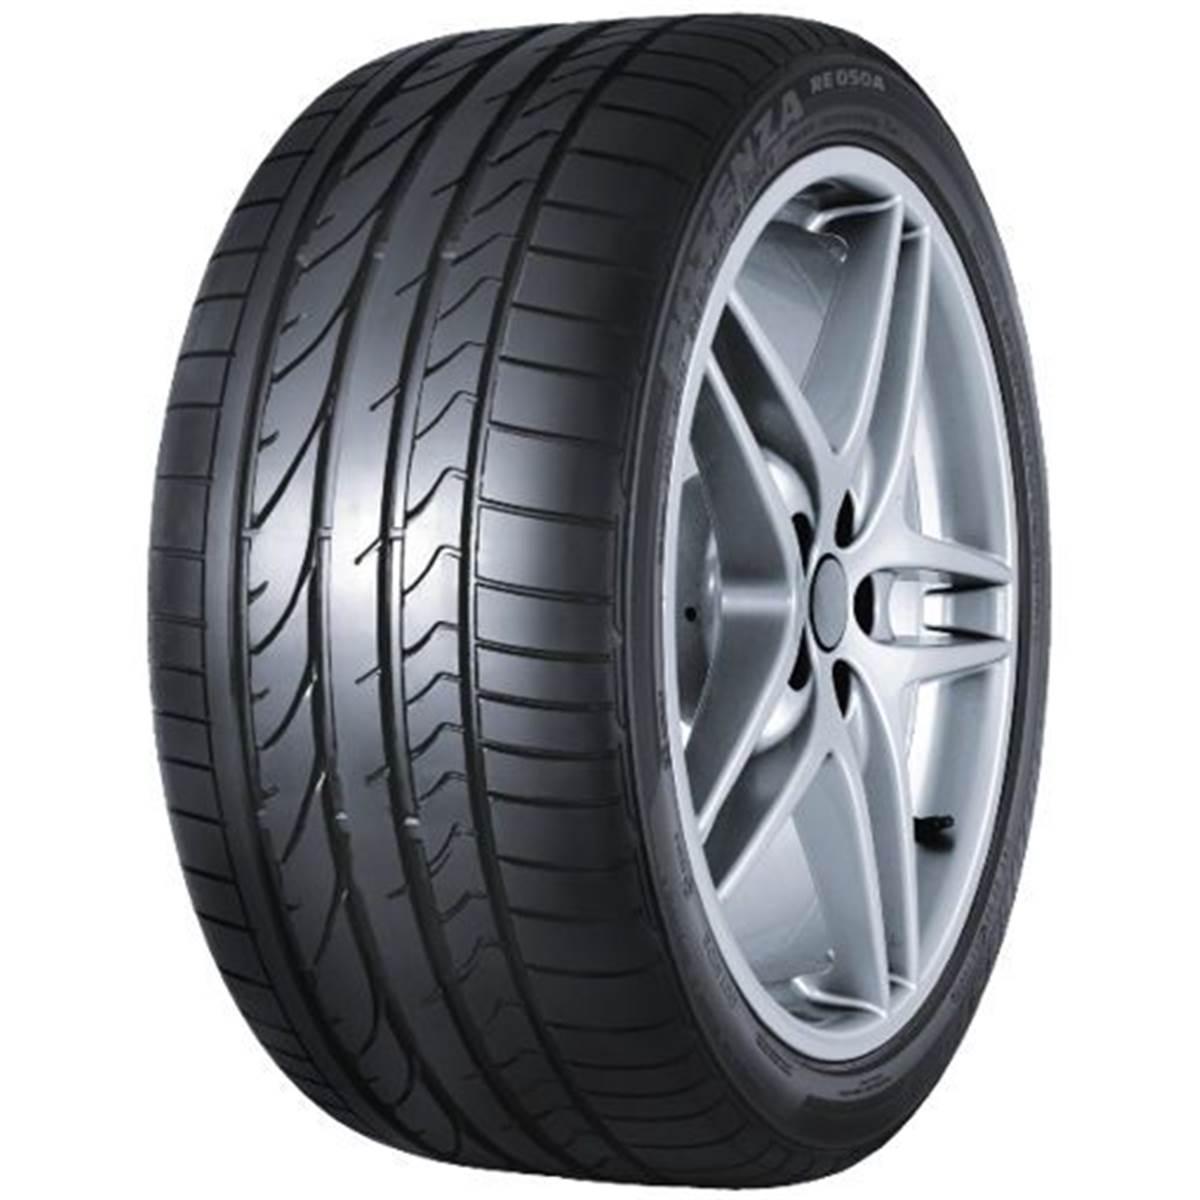 Pneu Runflat Bridgestone 245/40R18 93Y Potenza Re050A homologué BMW